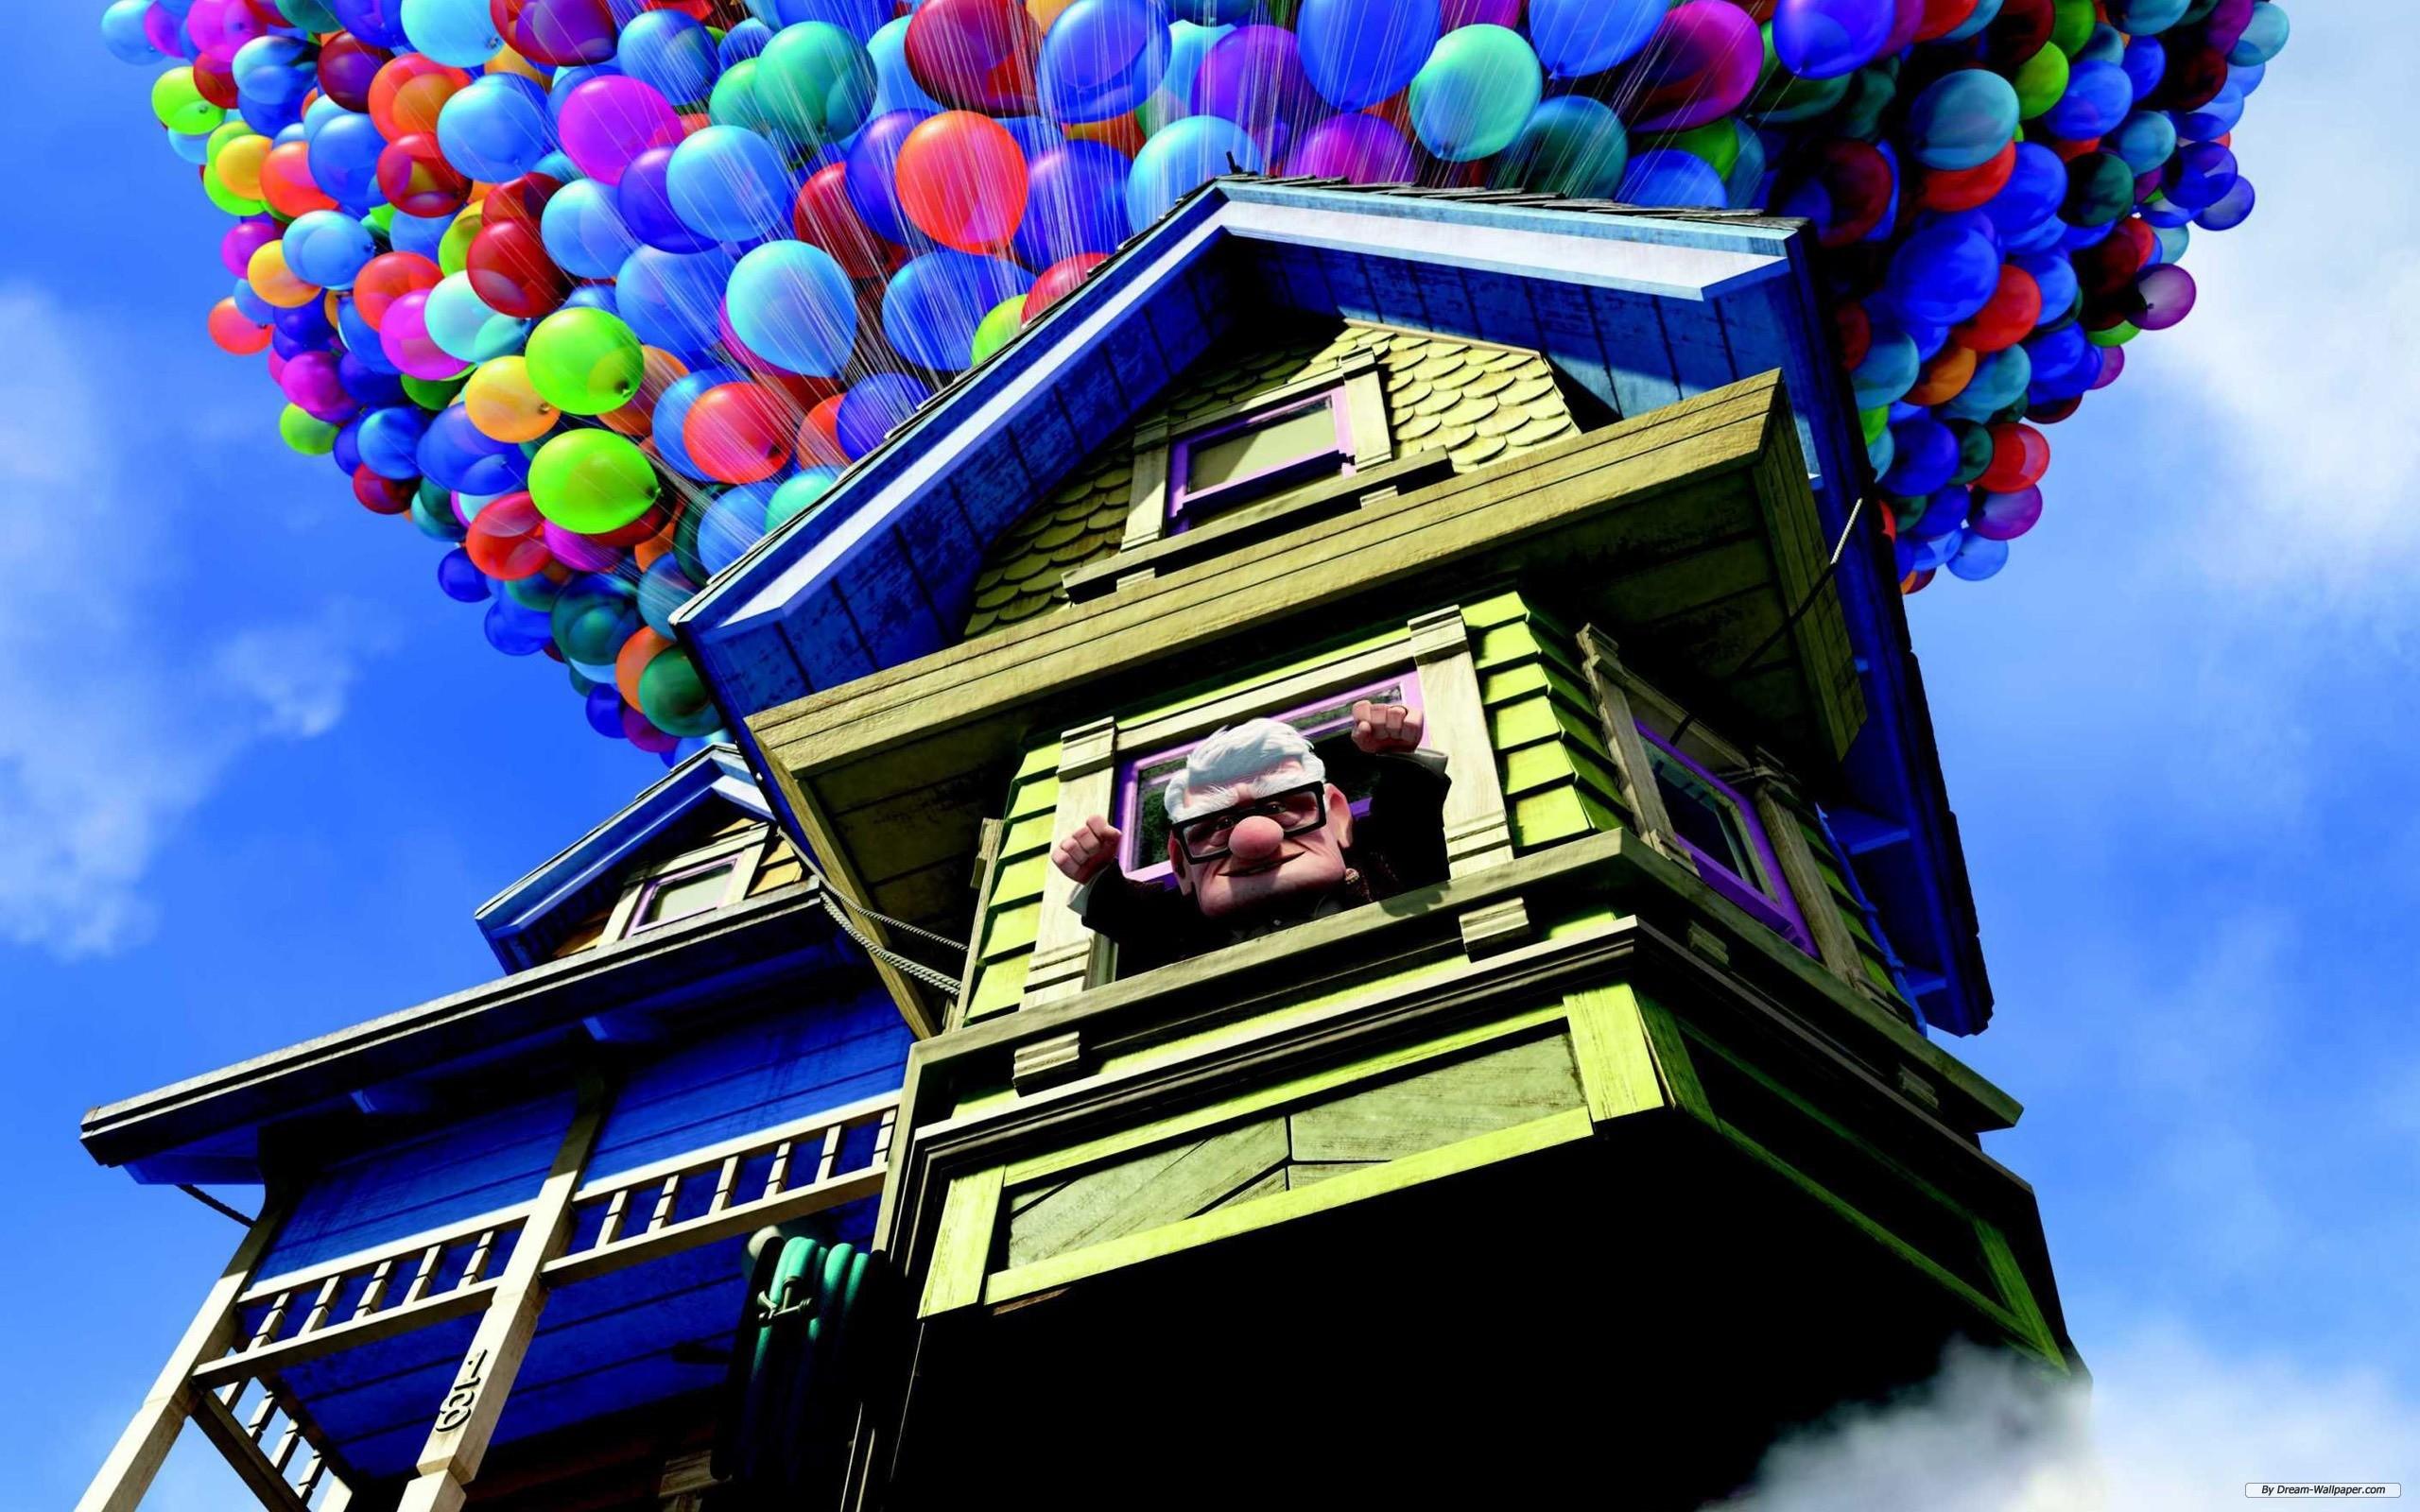 Pixar Up Wallpaper 62 Images